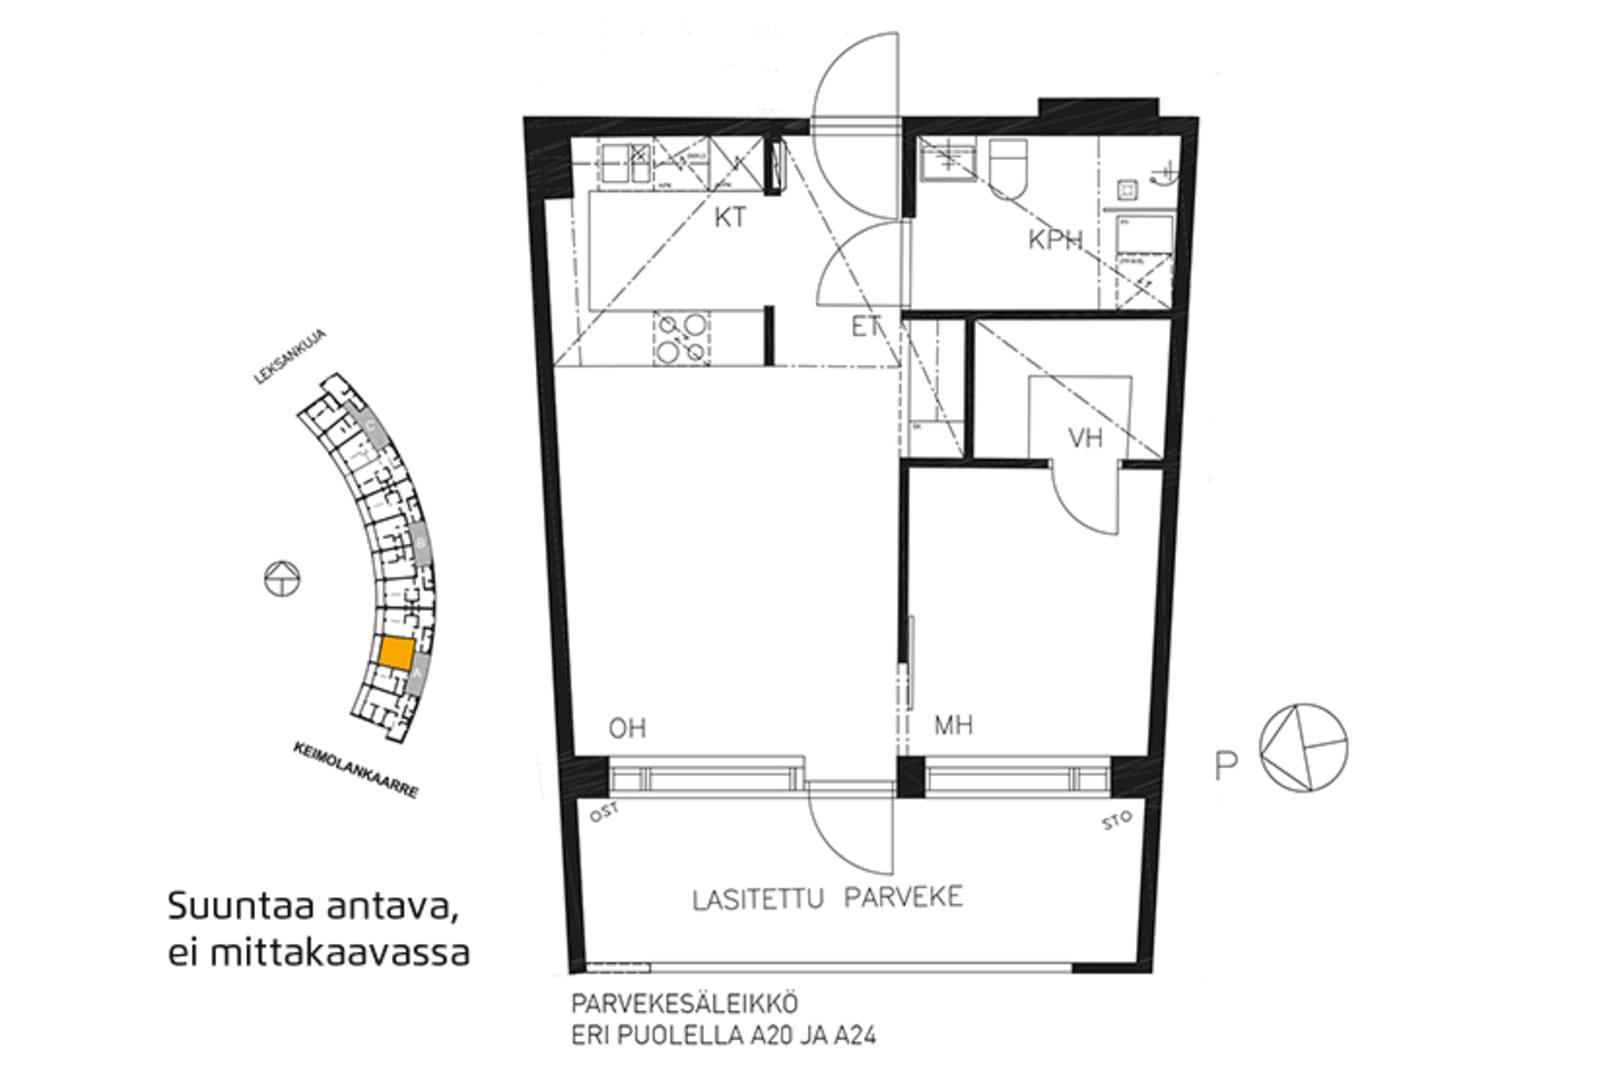 Vantaa, Keimolanmäki, Leksankuja 3 A 016